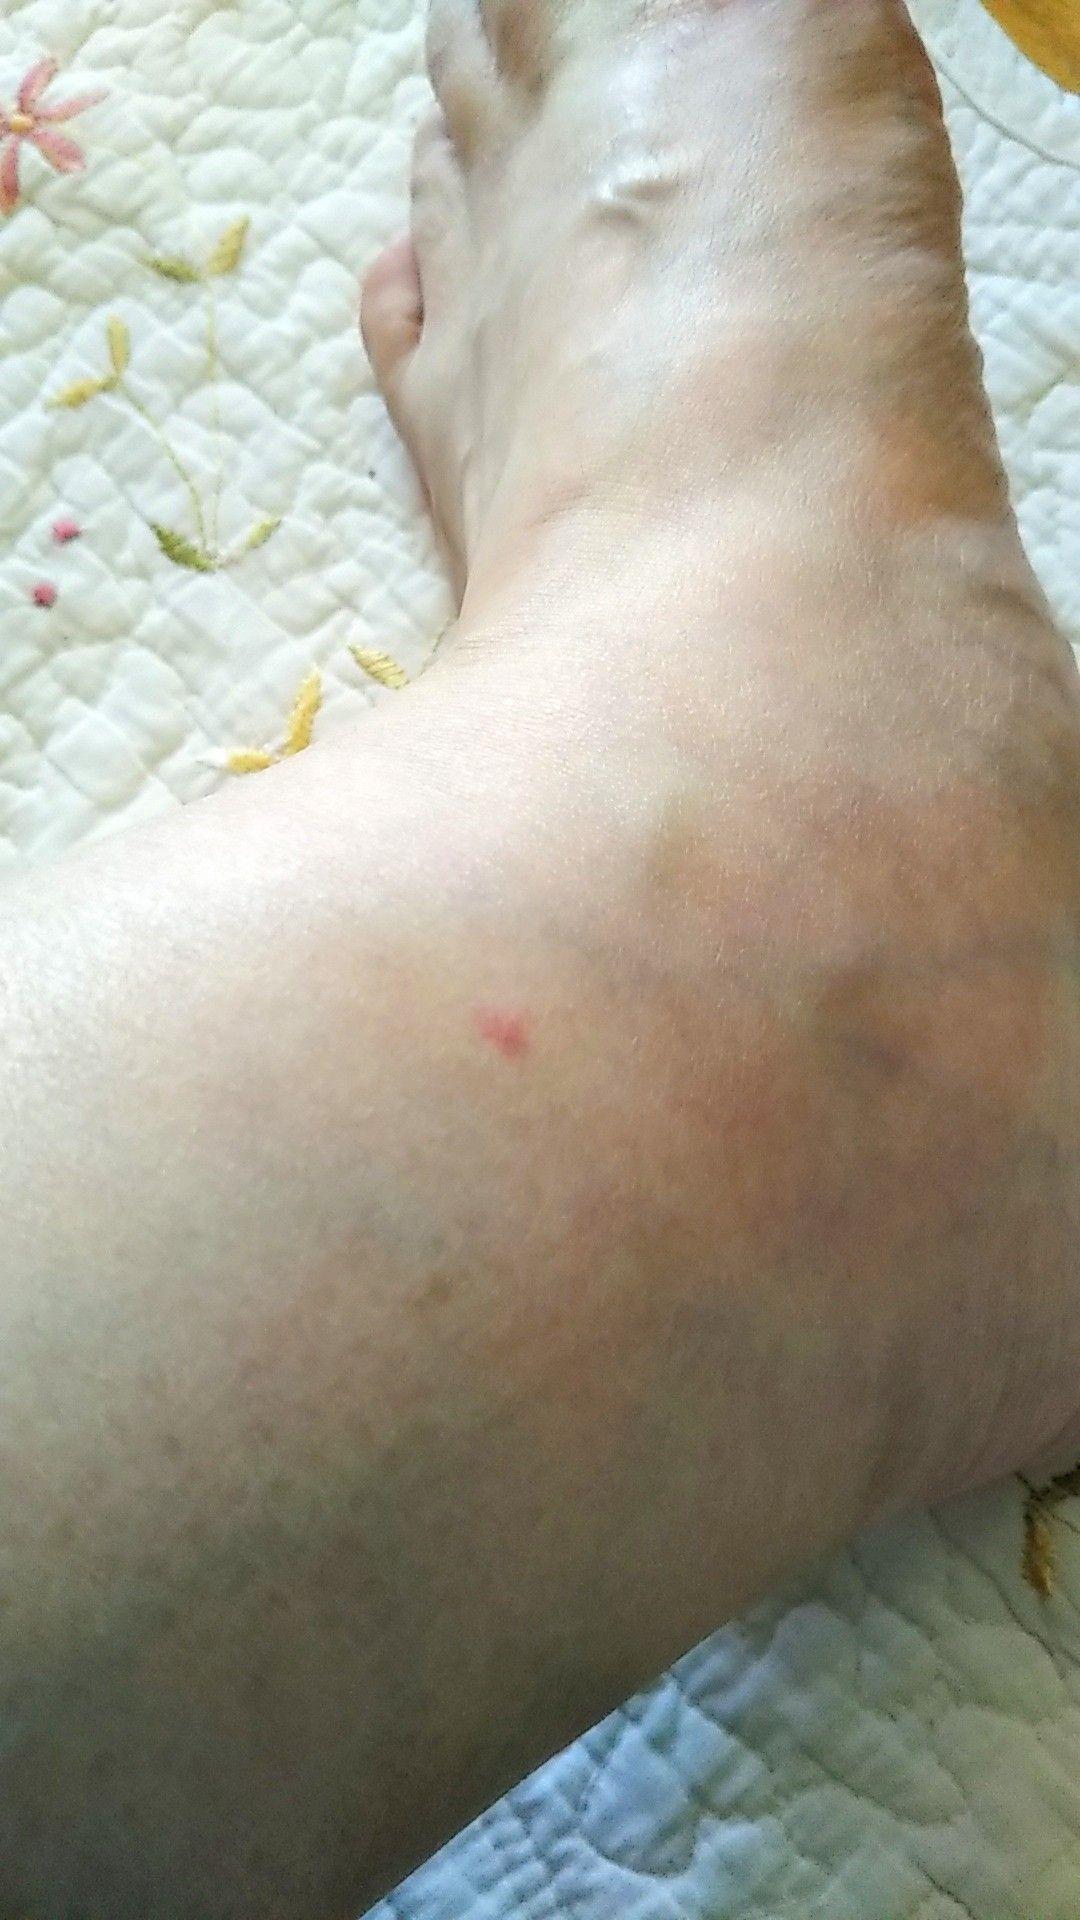 慢性 蕁 麻疹 完治 ブログ